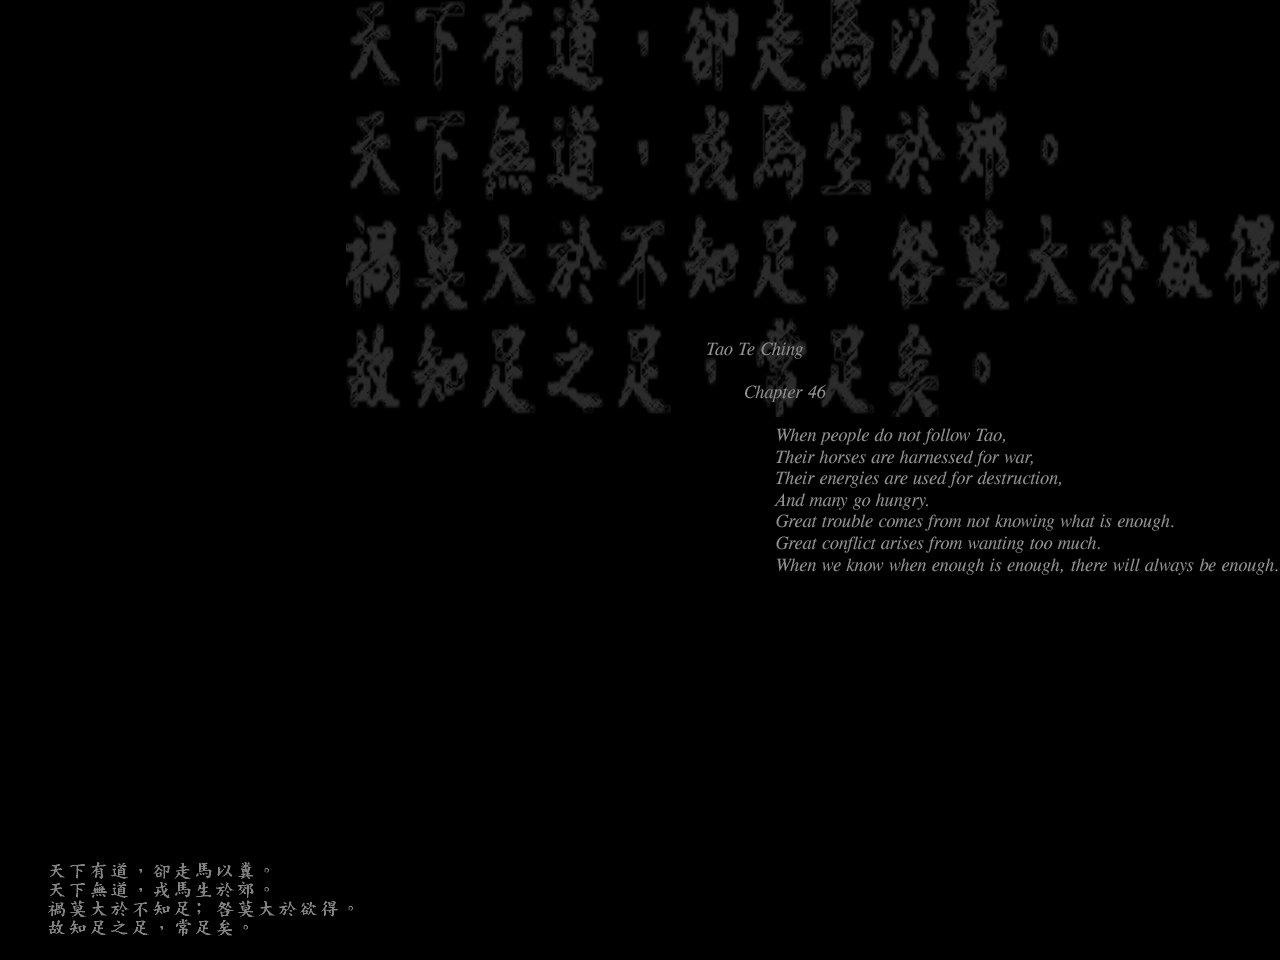 Tao Te Ching 46 by SpiritUnreal 1280x960